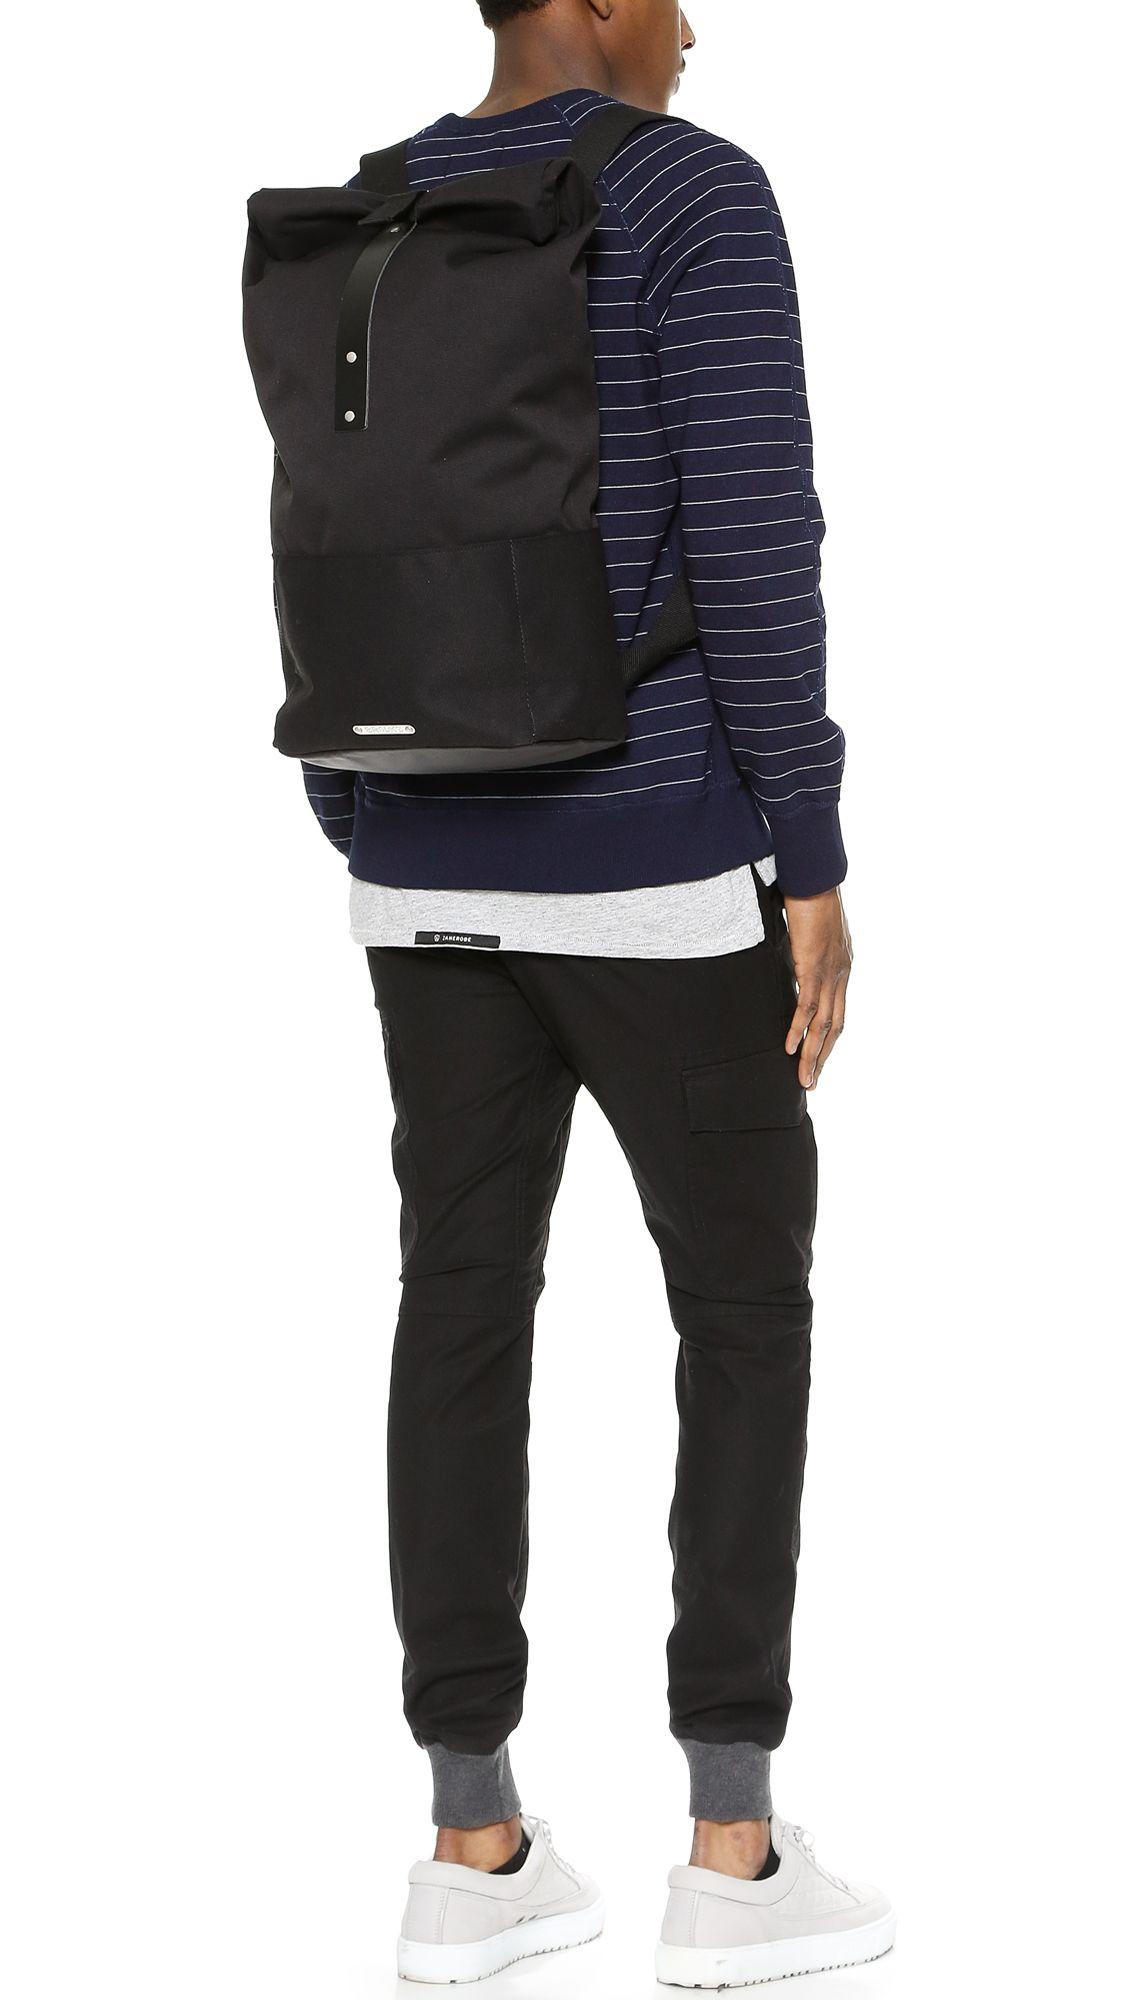 fe90927c6bb Hackney Utility Backpack | Real men use: | Brooks england, Backpacks ...